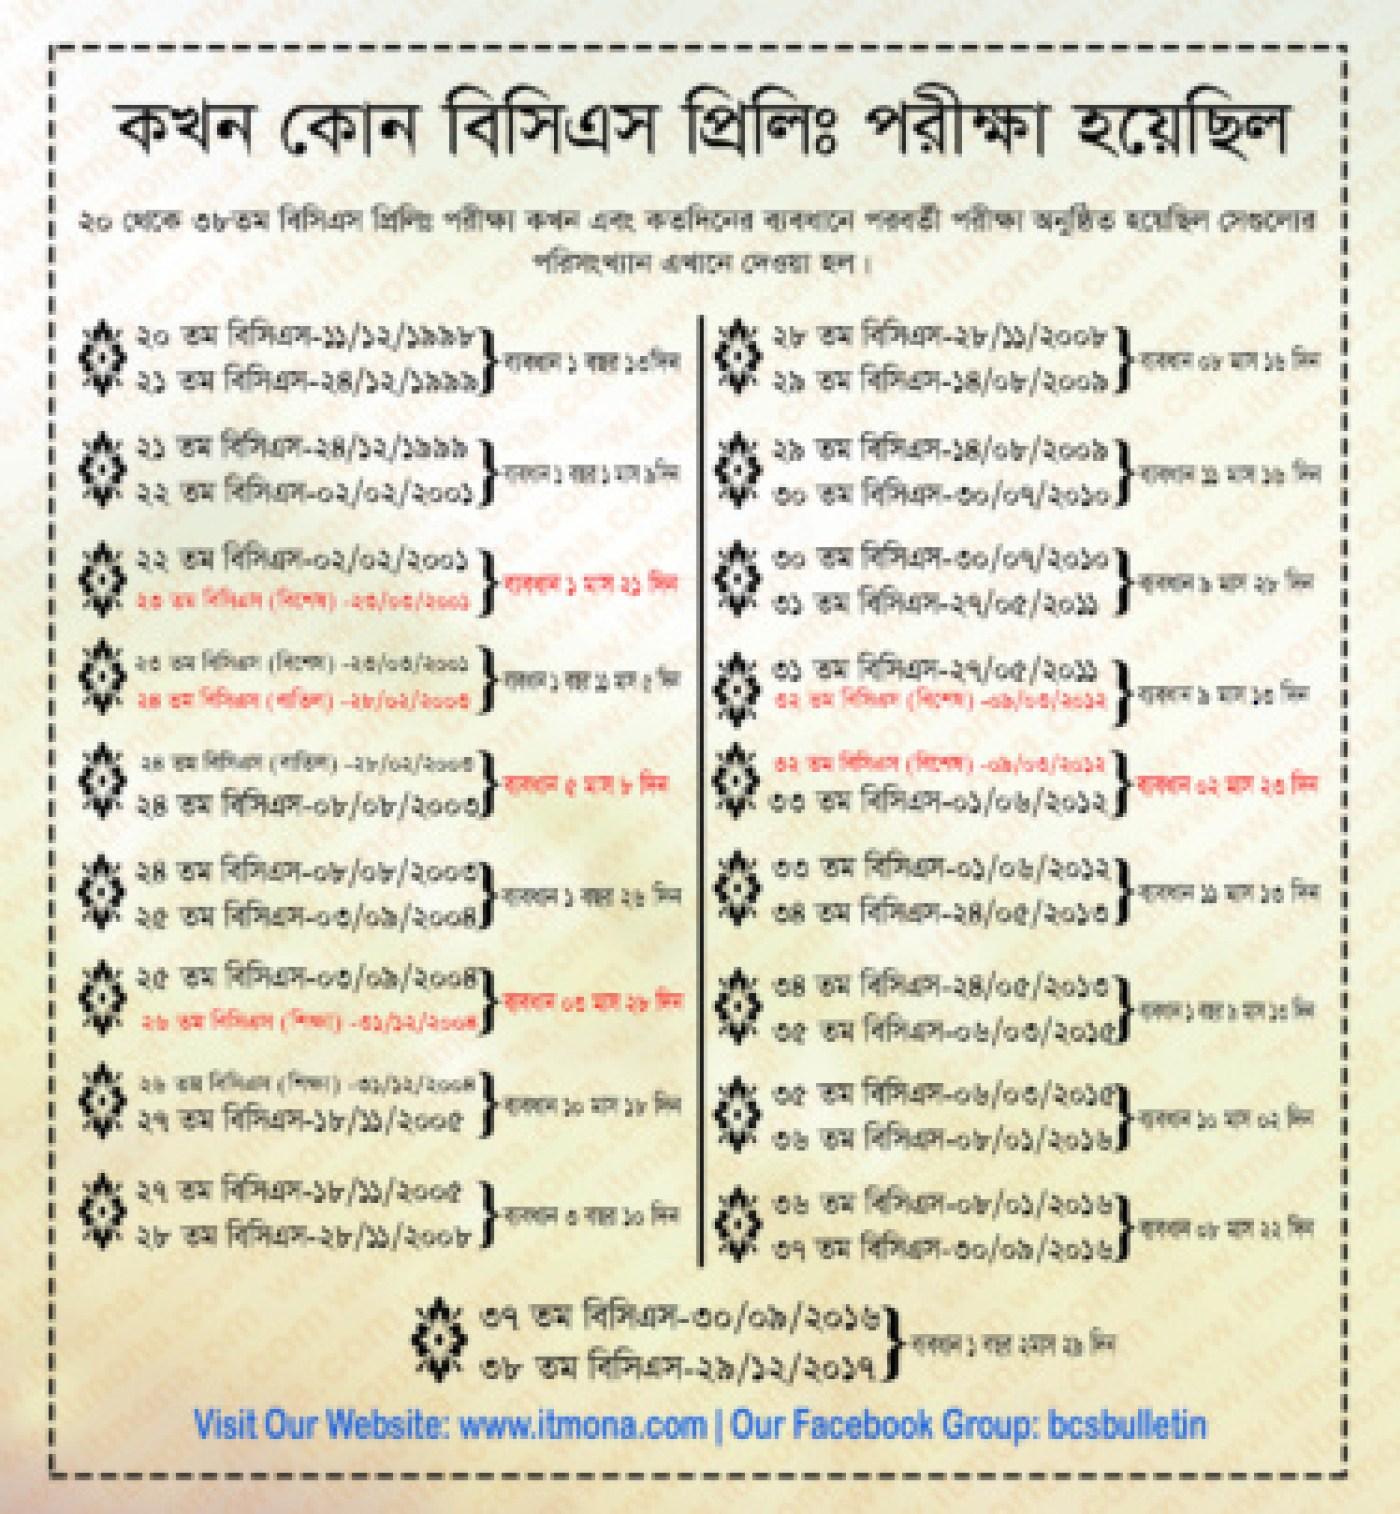 39th & 40th priliminary exam circular